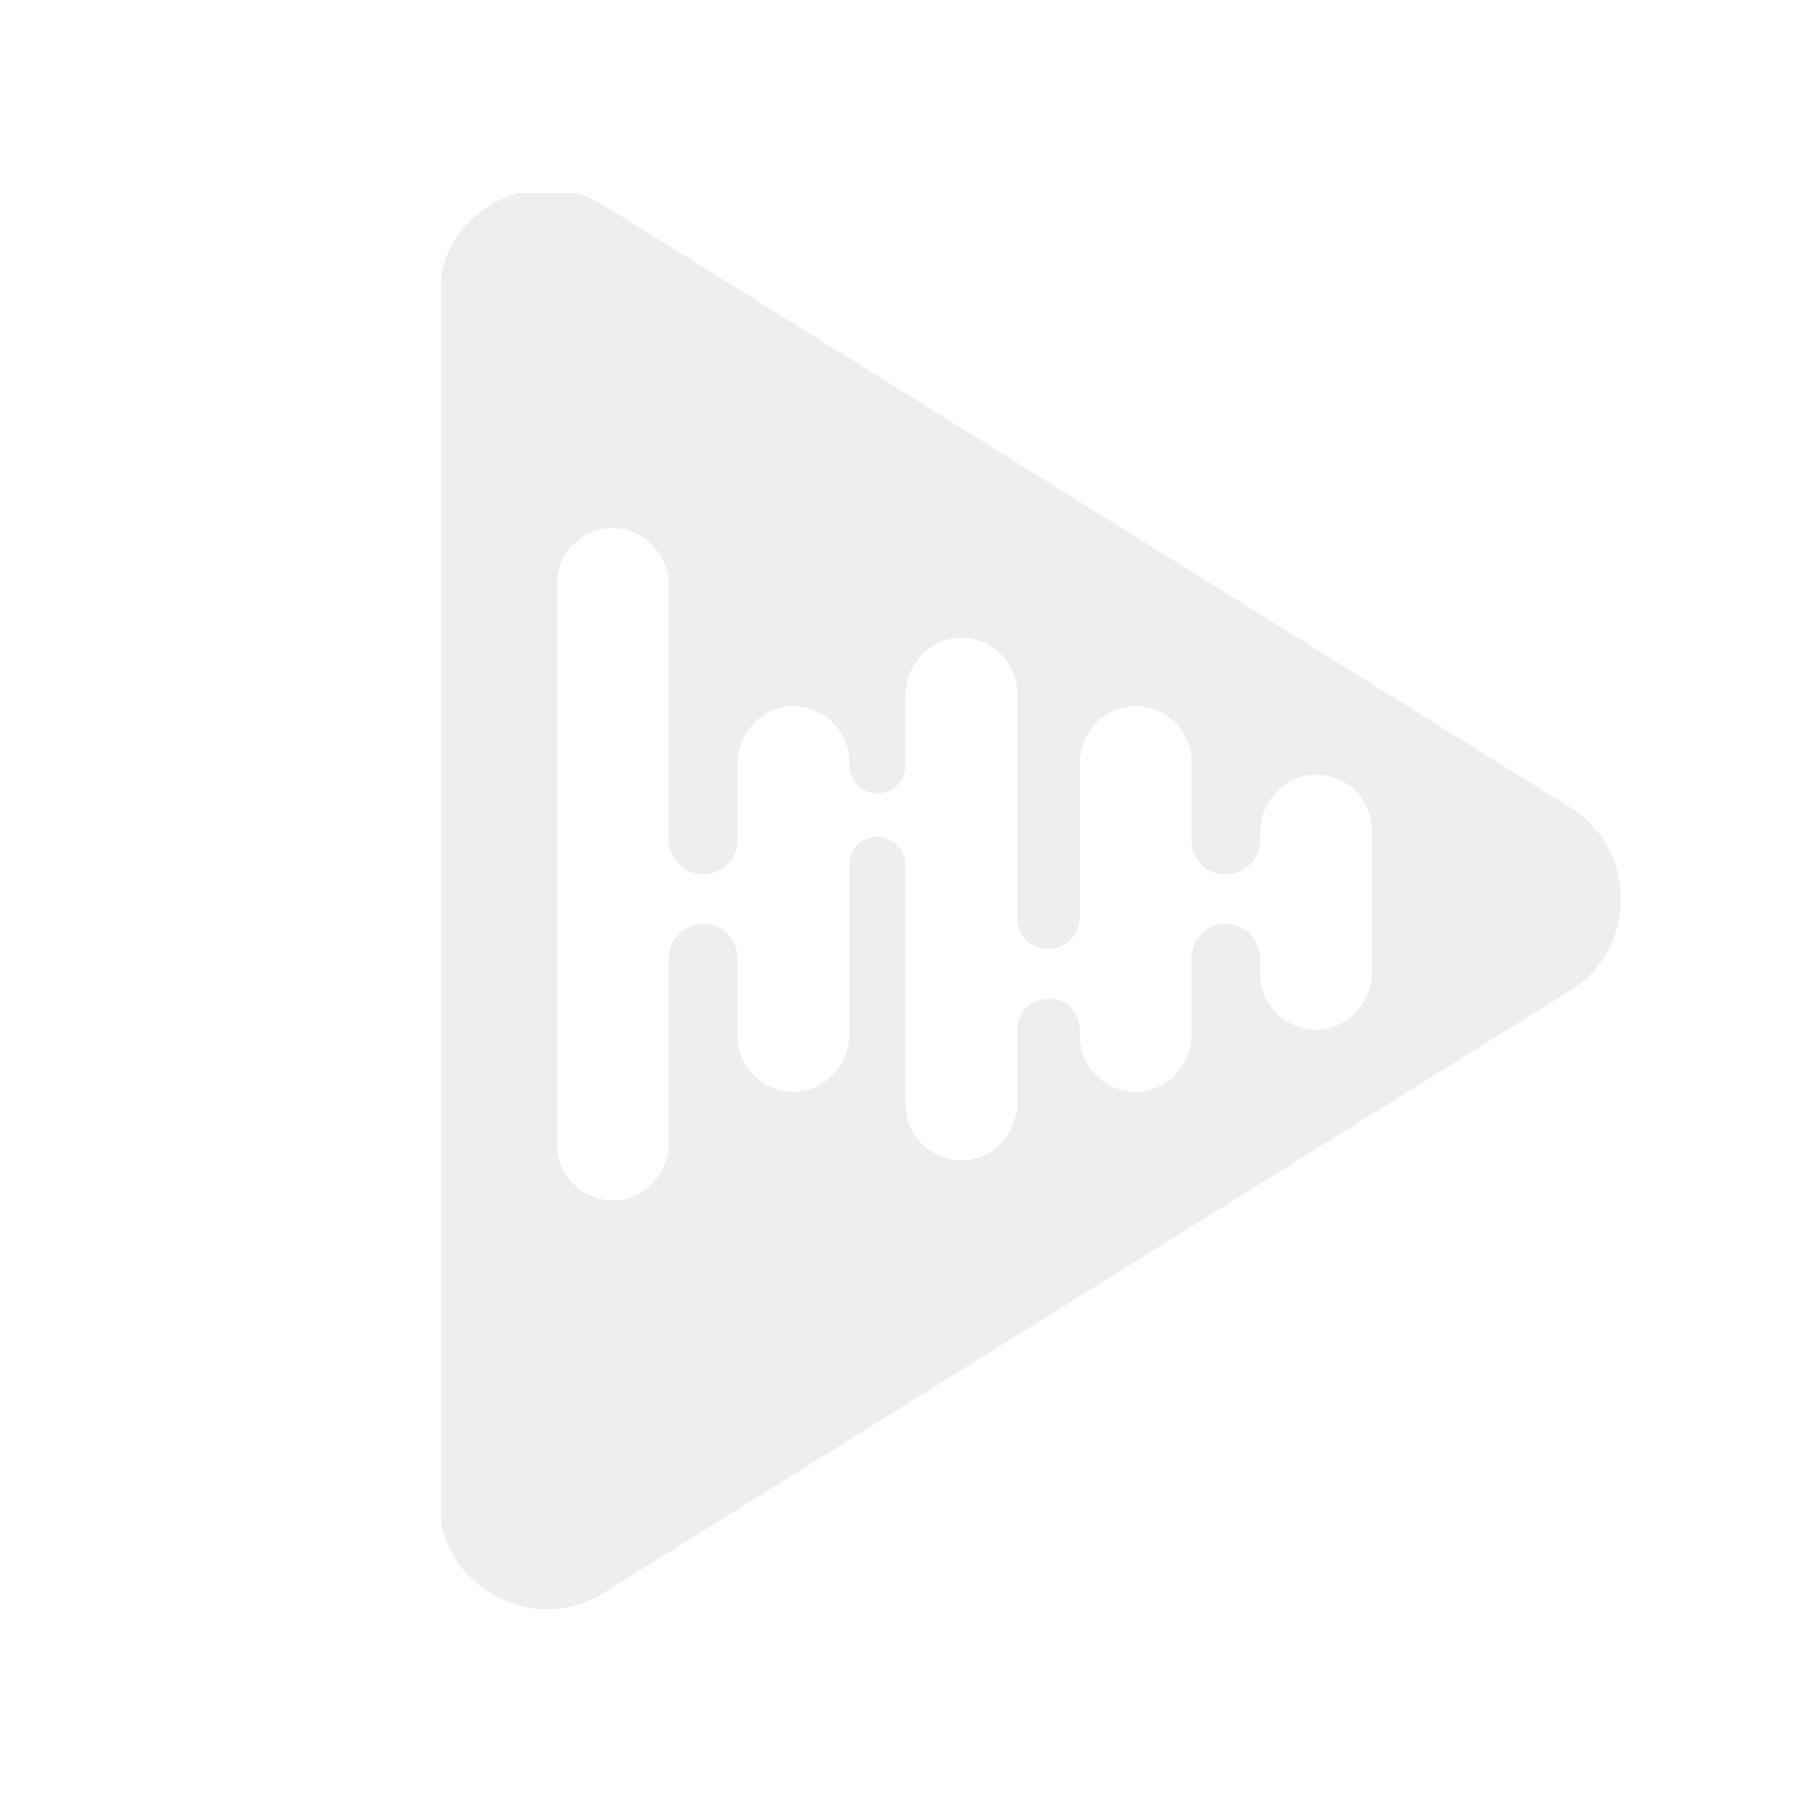 Connect GR00006 - Universal høyttalergrill, 100mm/4